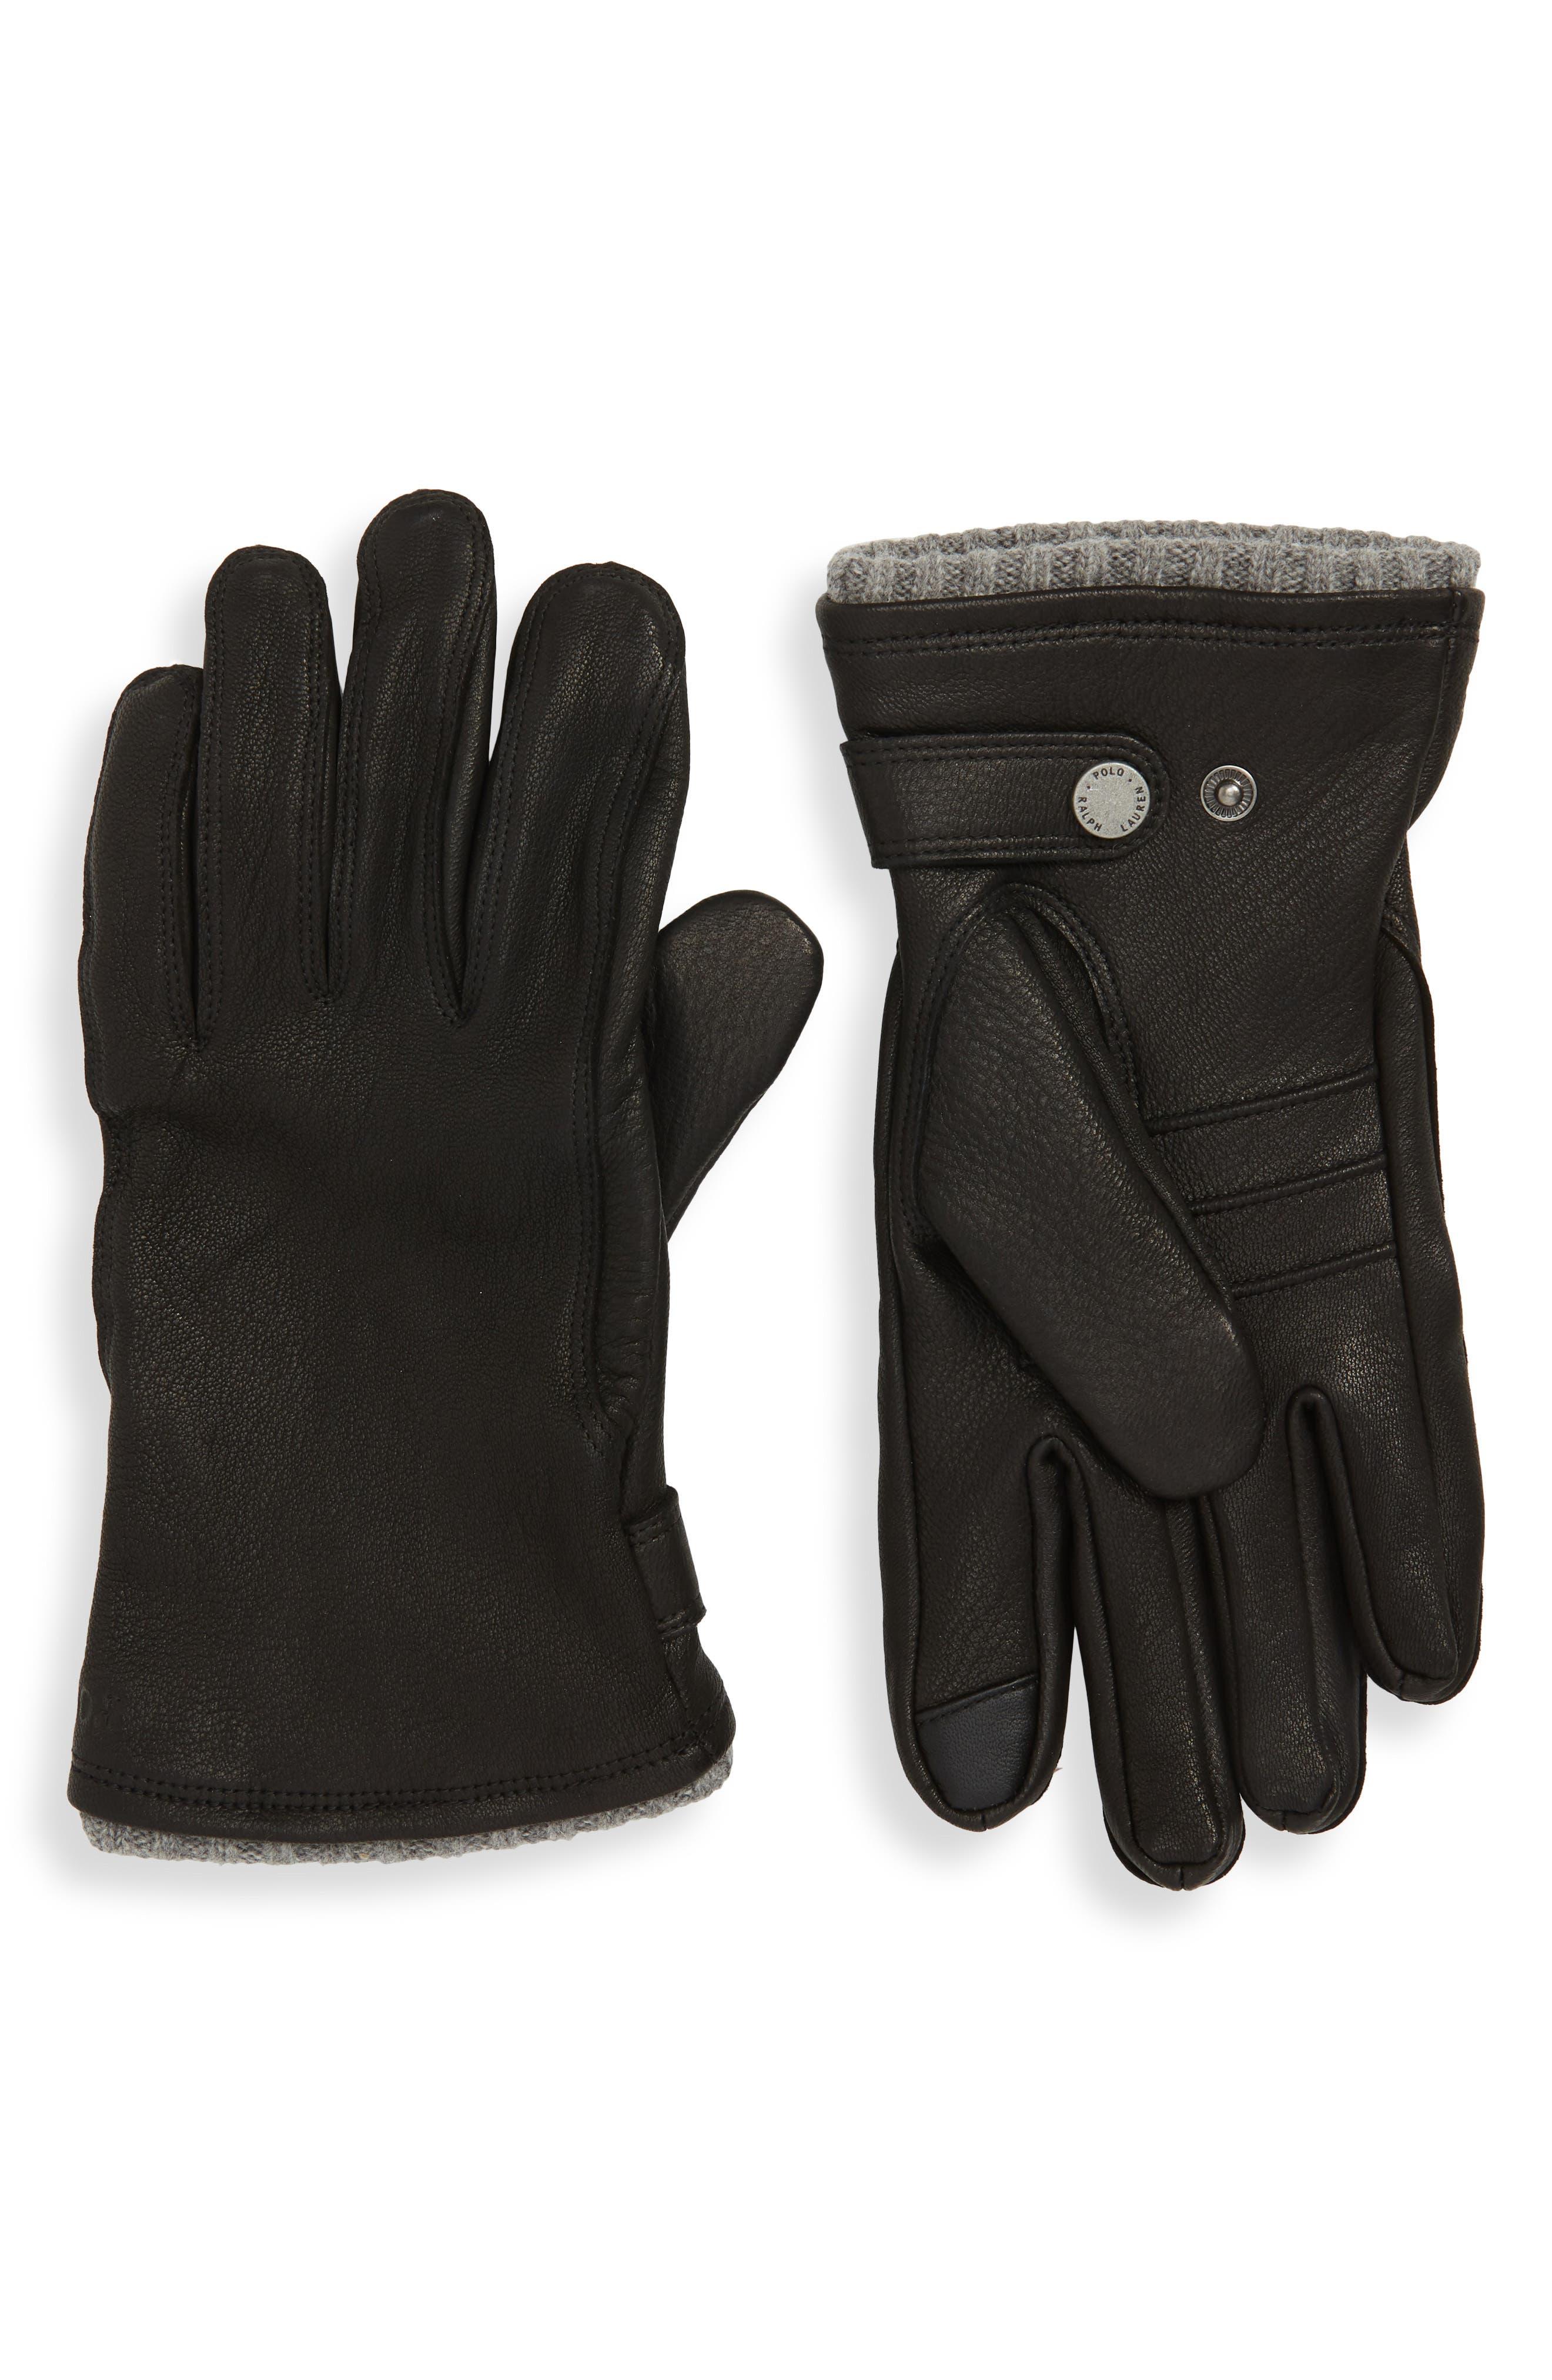 POLO RALPH LAUREN, Deerskin Gloves, Main thumbnail 1, color, BLACK